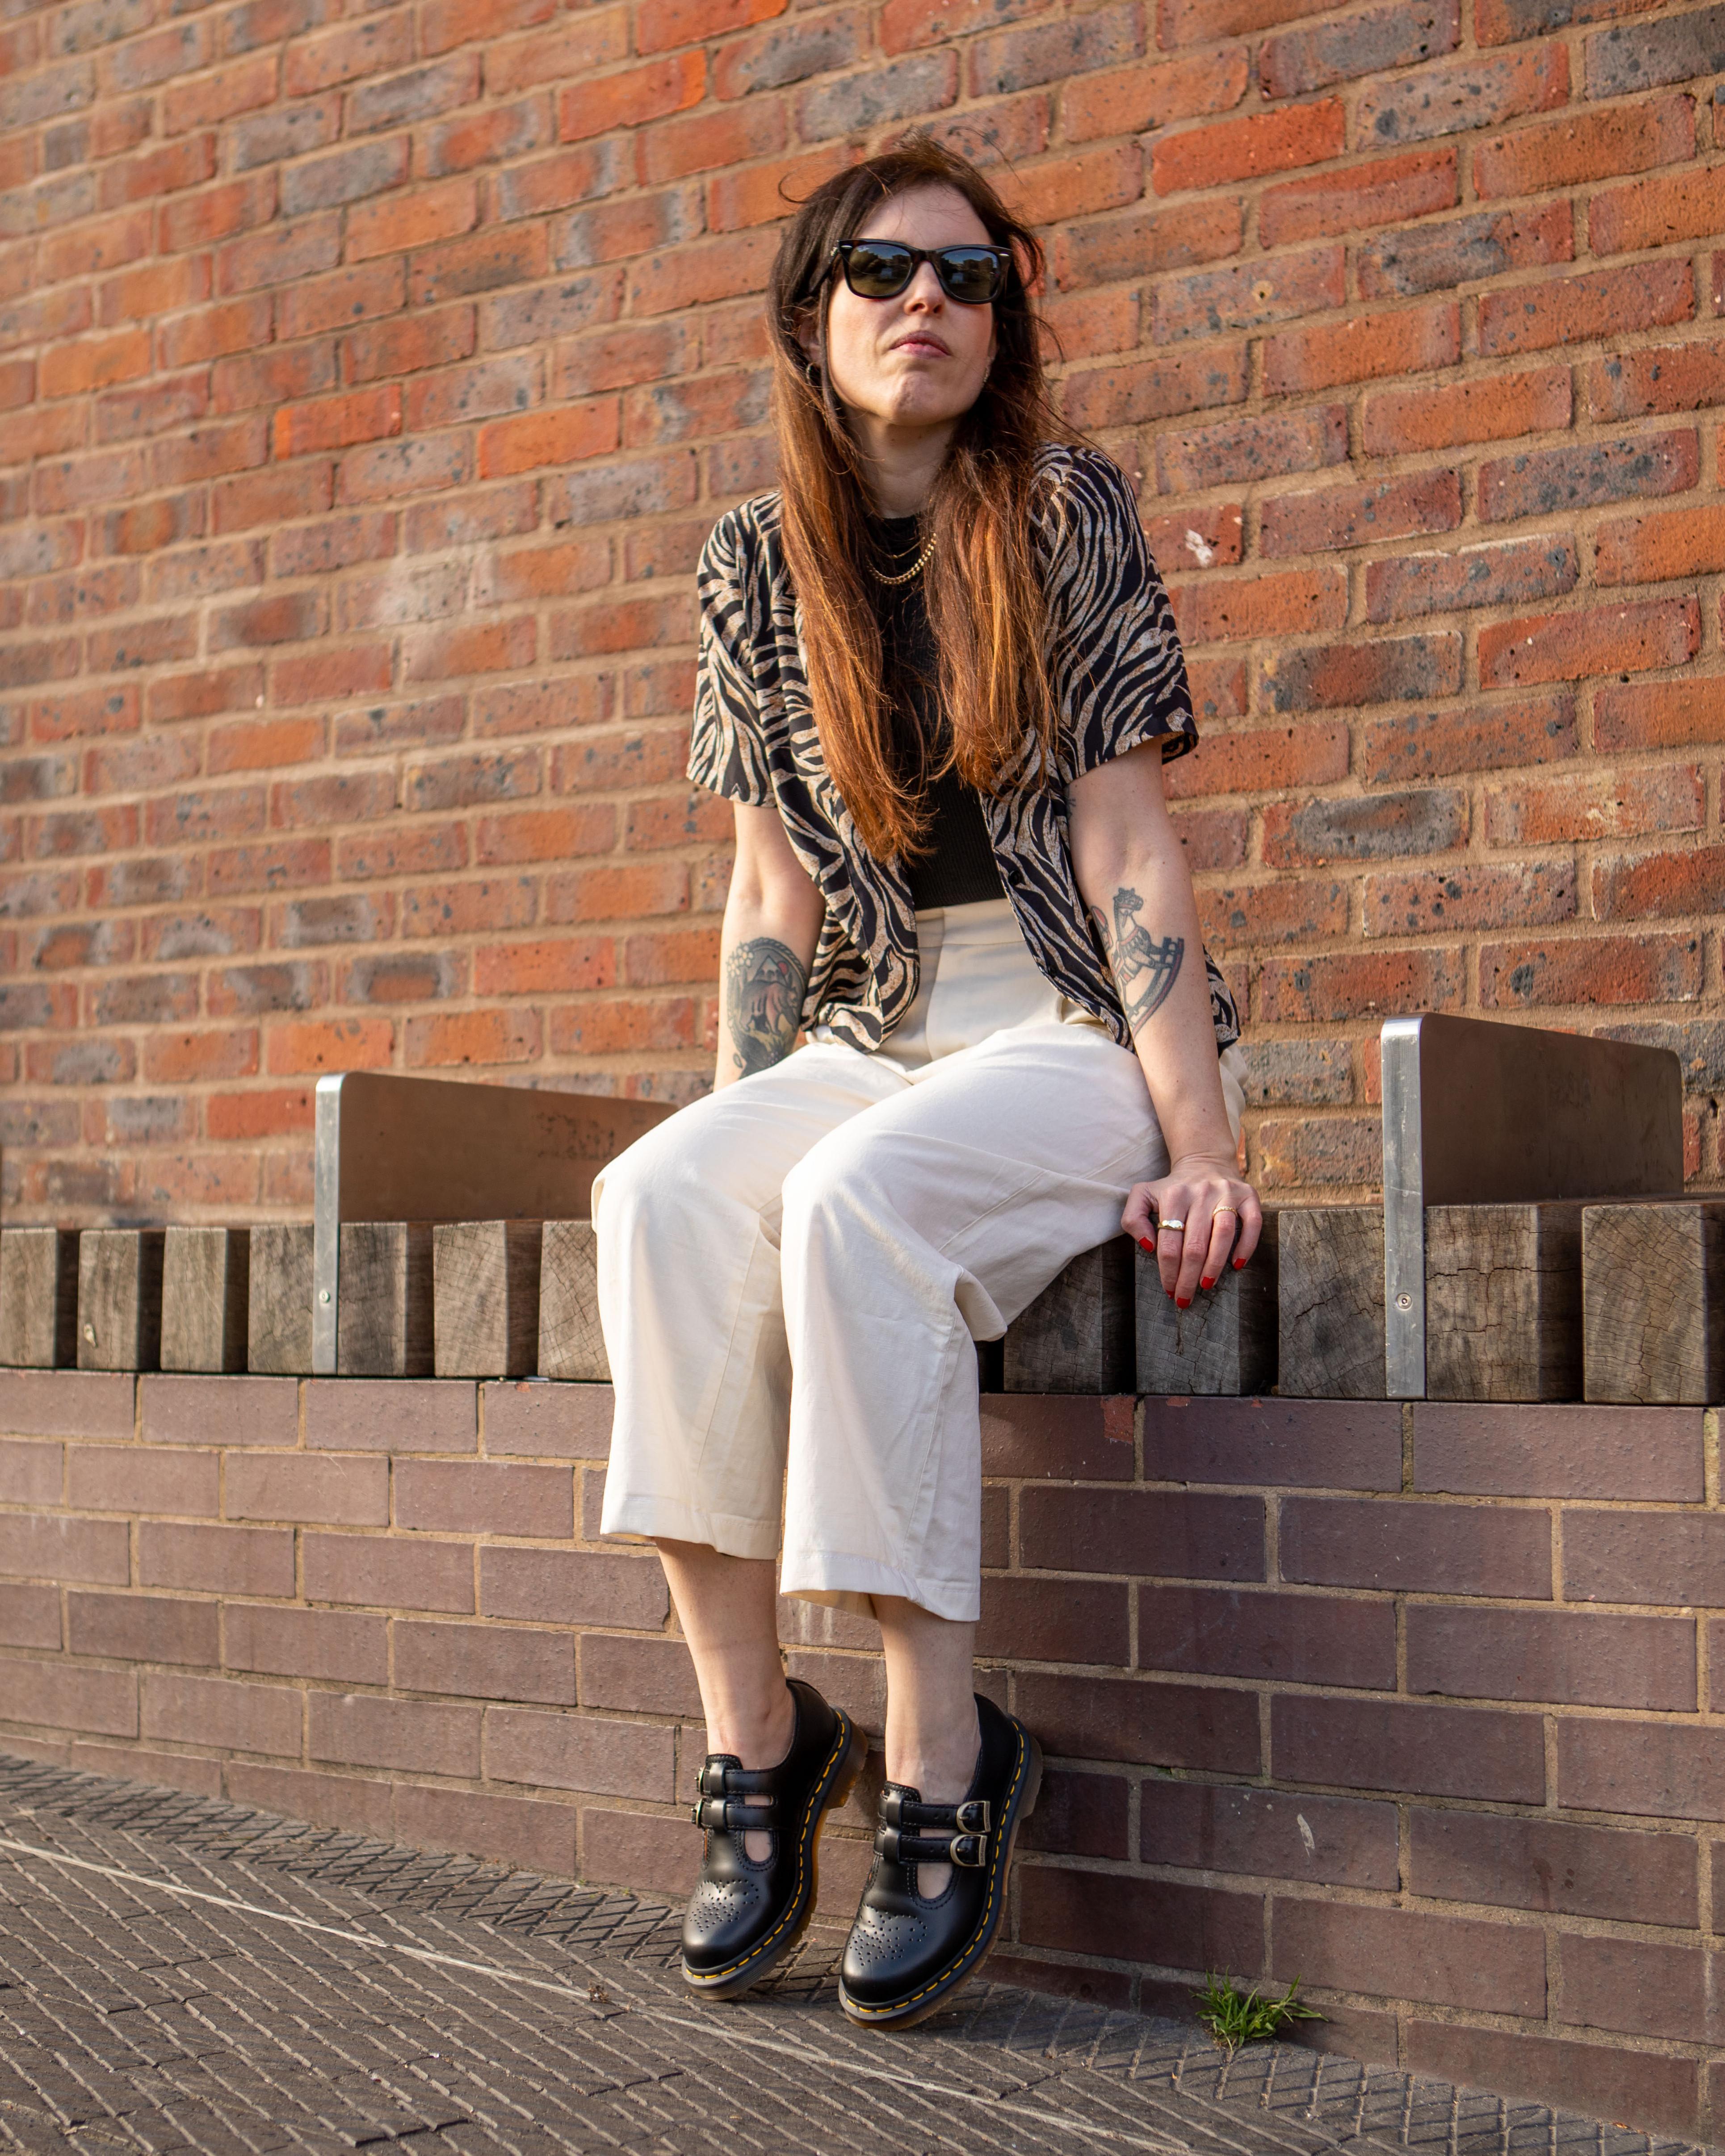 doc martin mary jane shoes